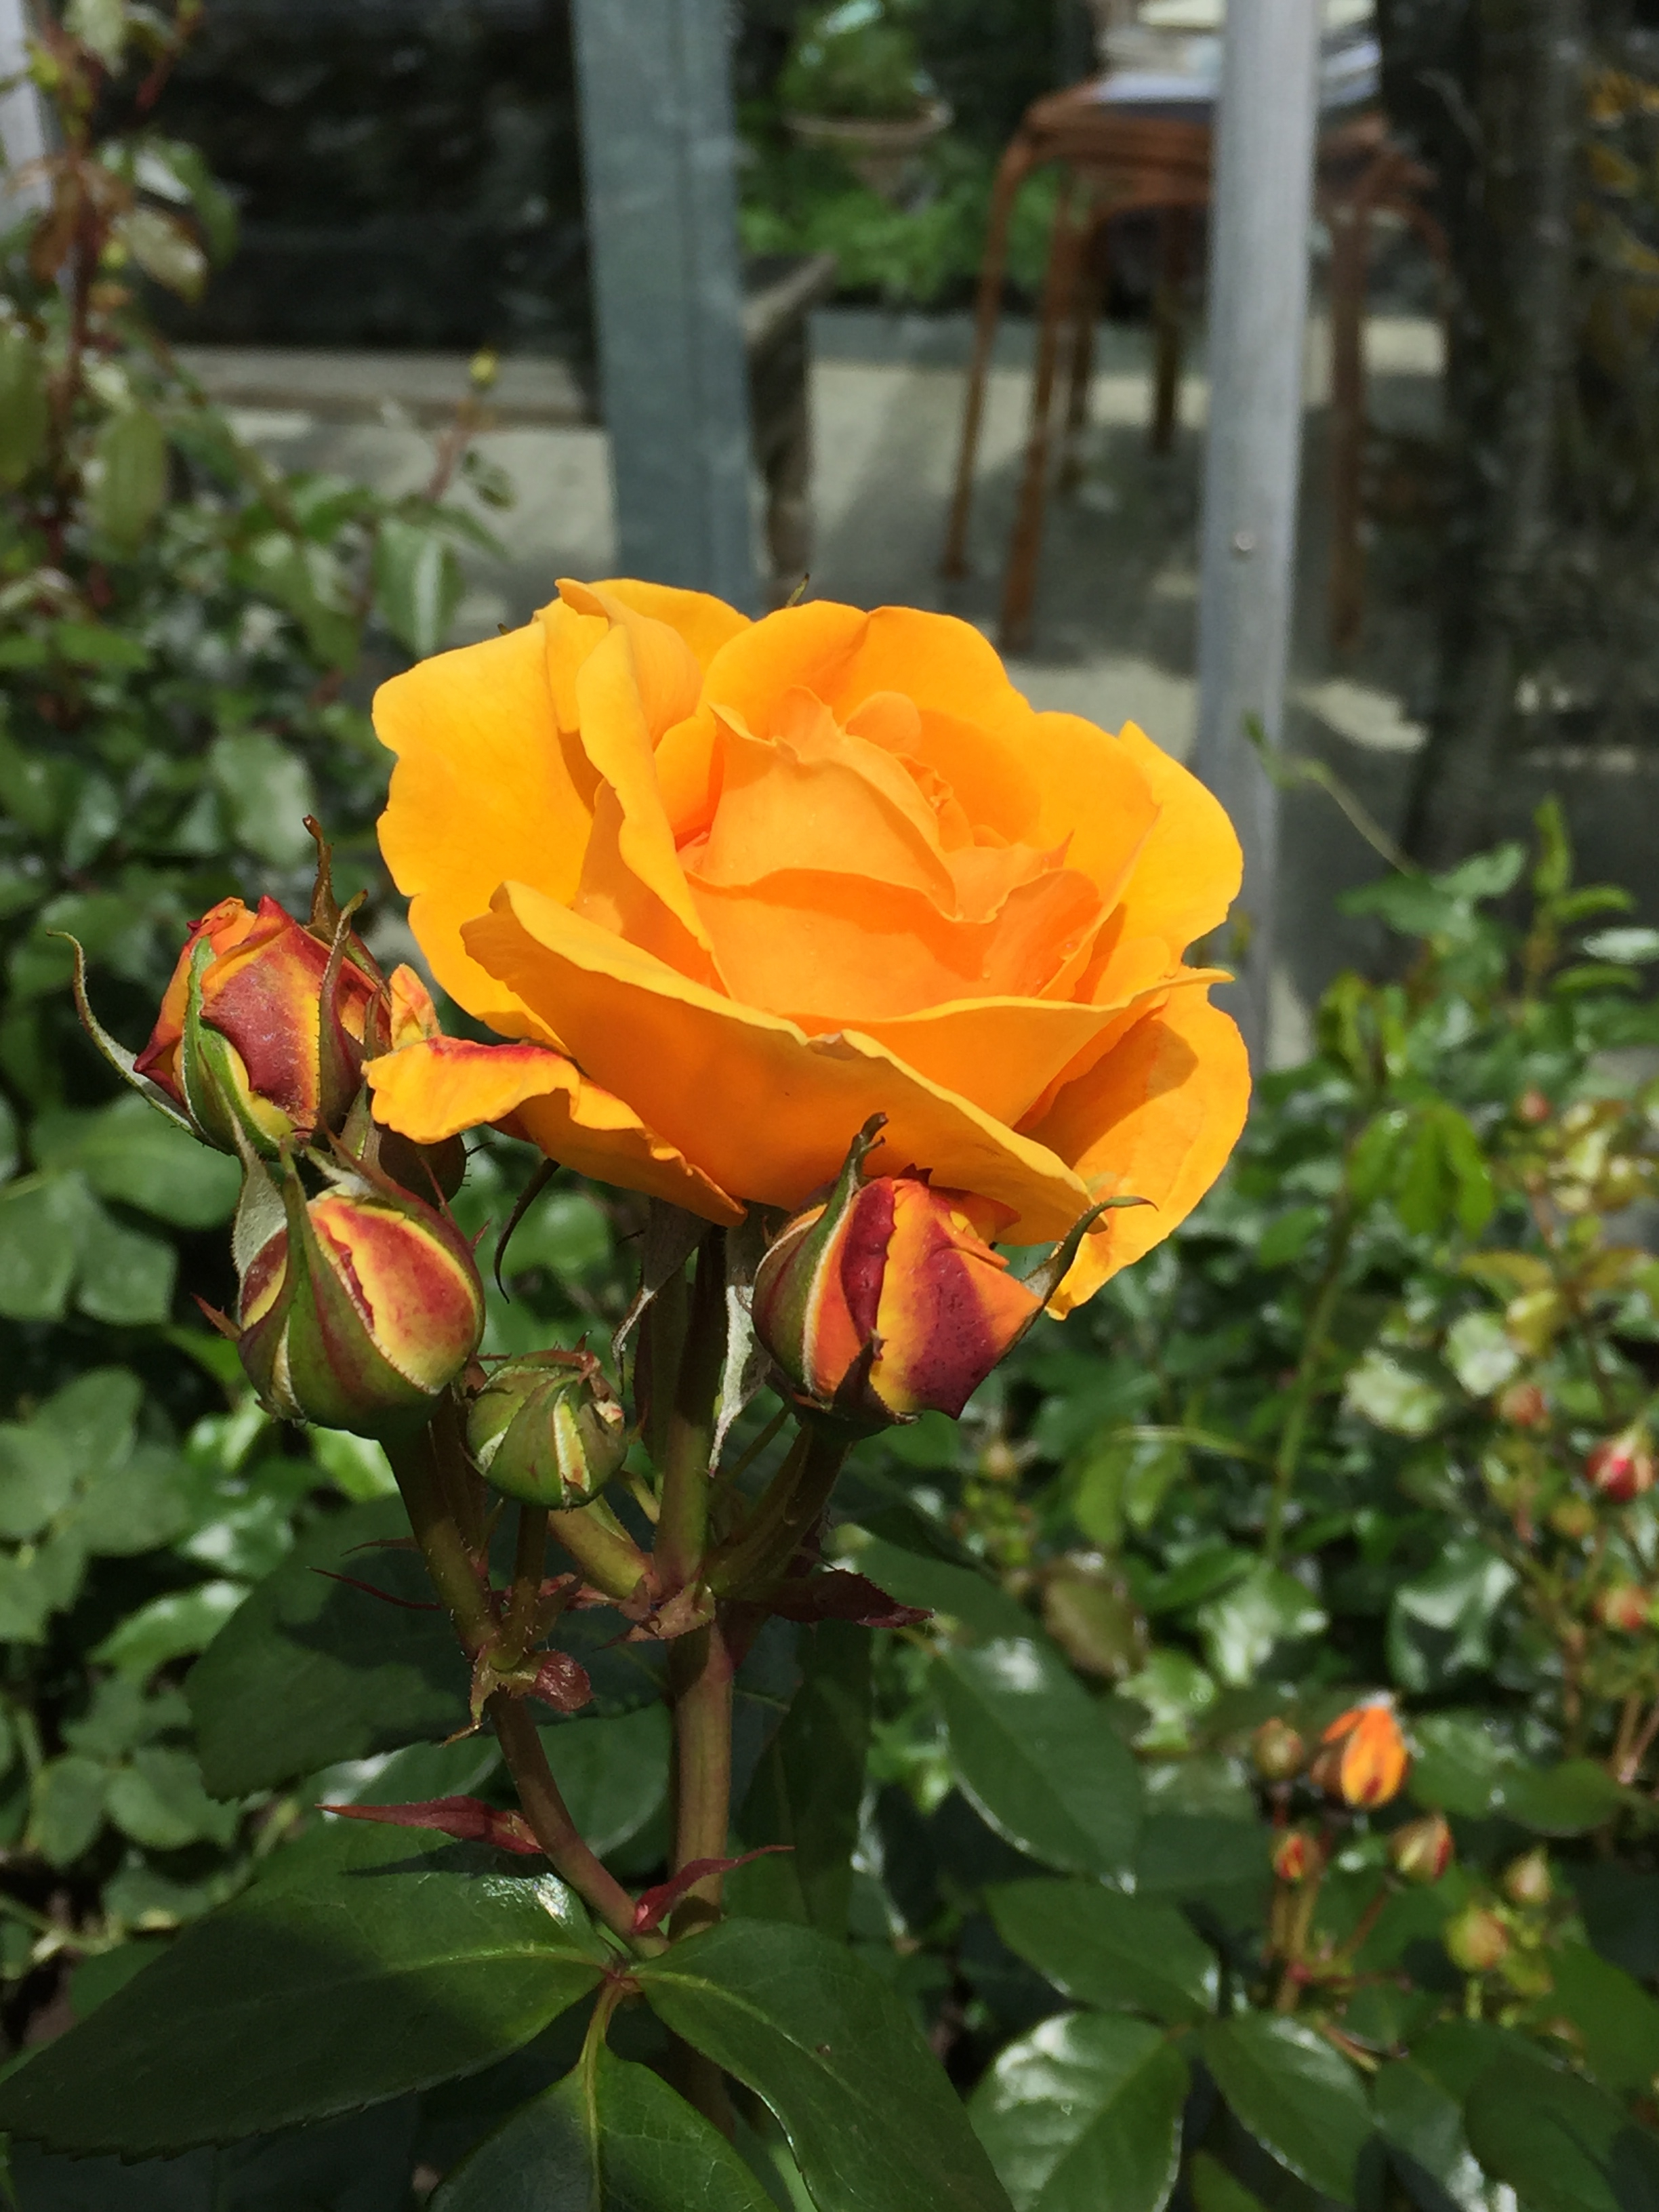 Plant'n'Relax - Roses Forever